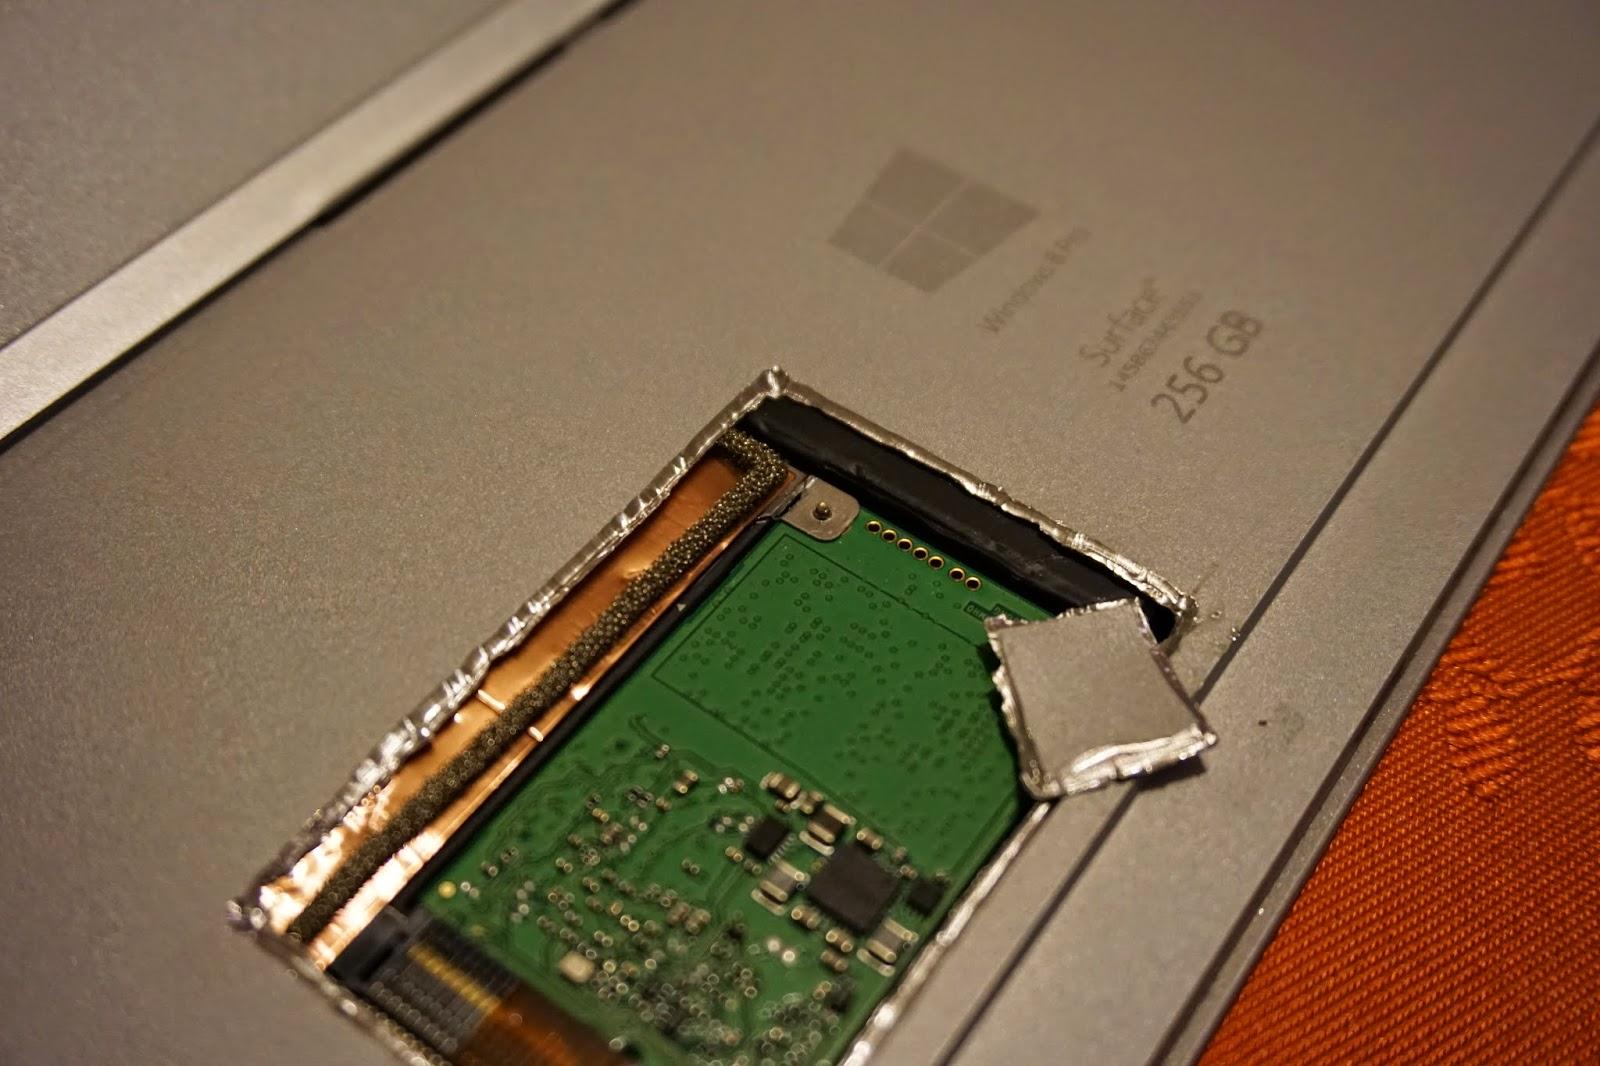 upgrading a surface pro - photo #9